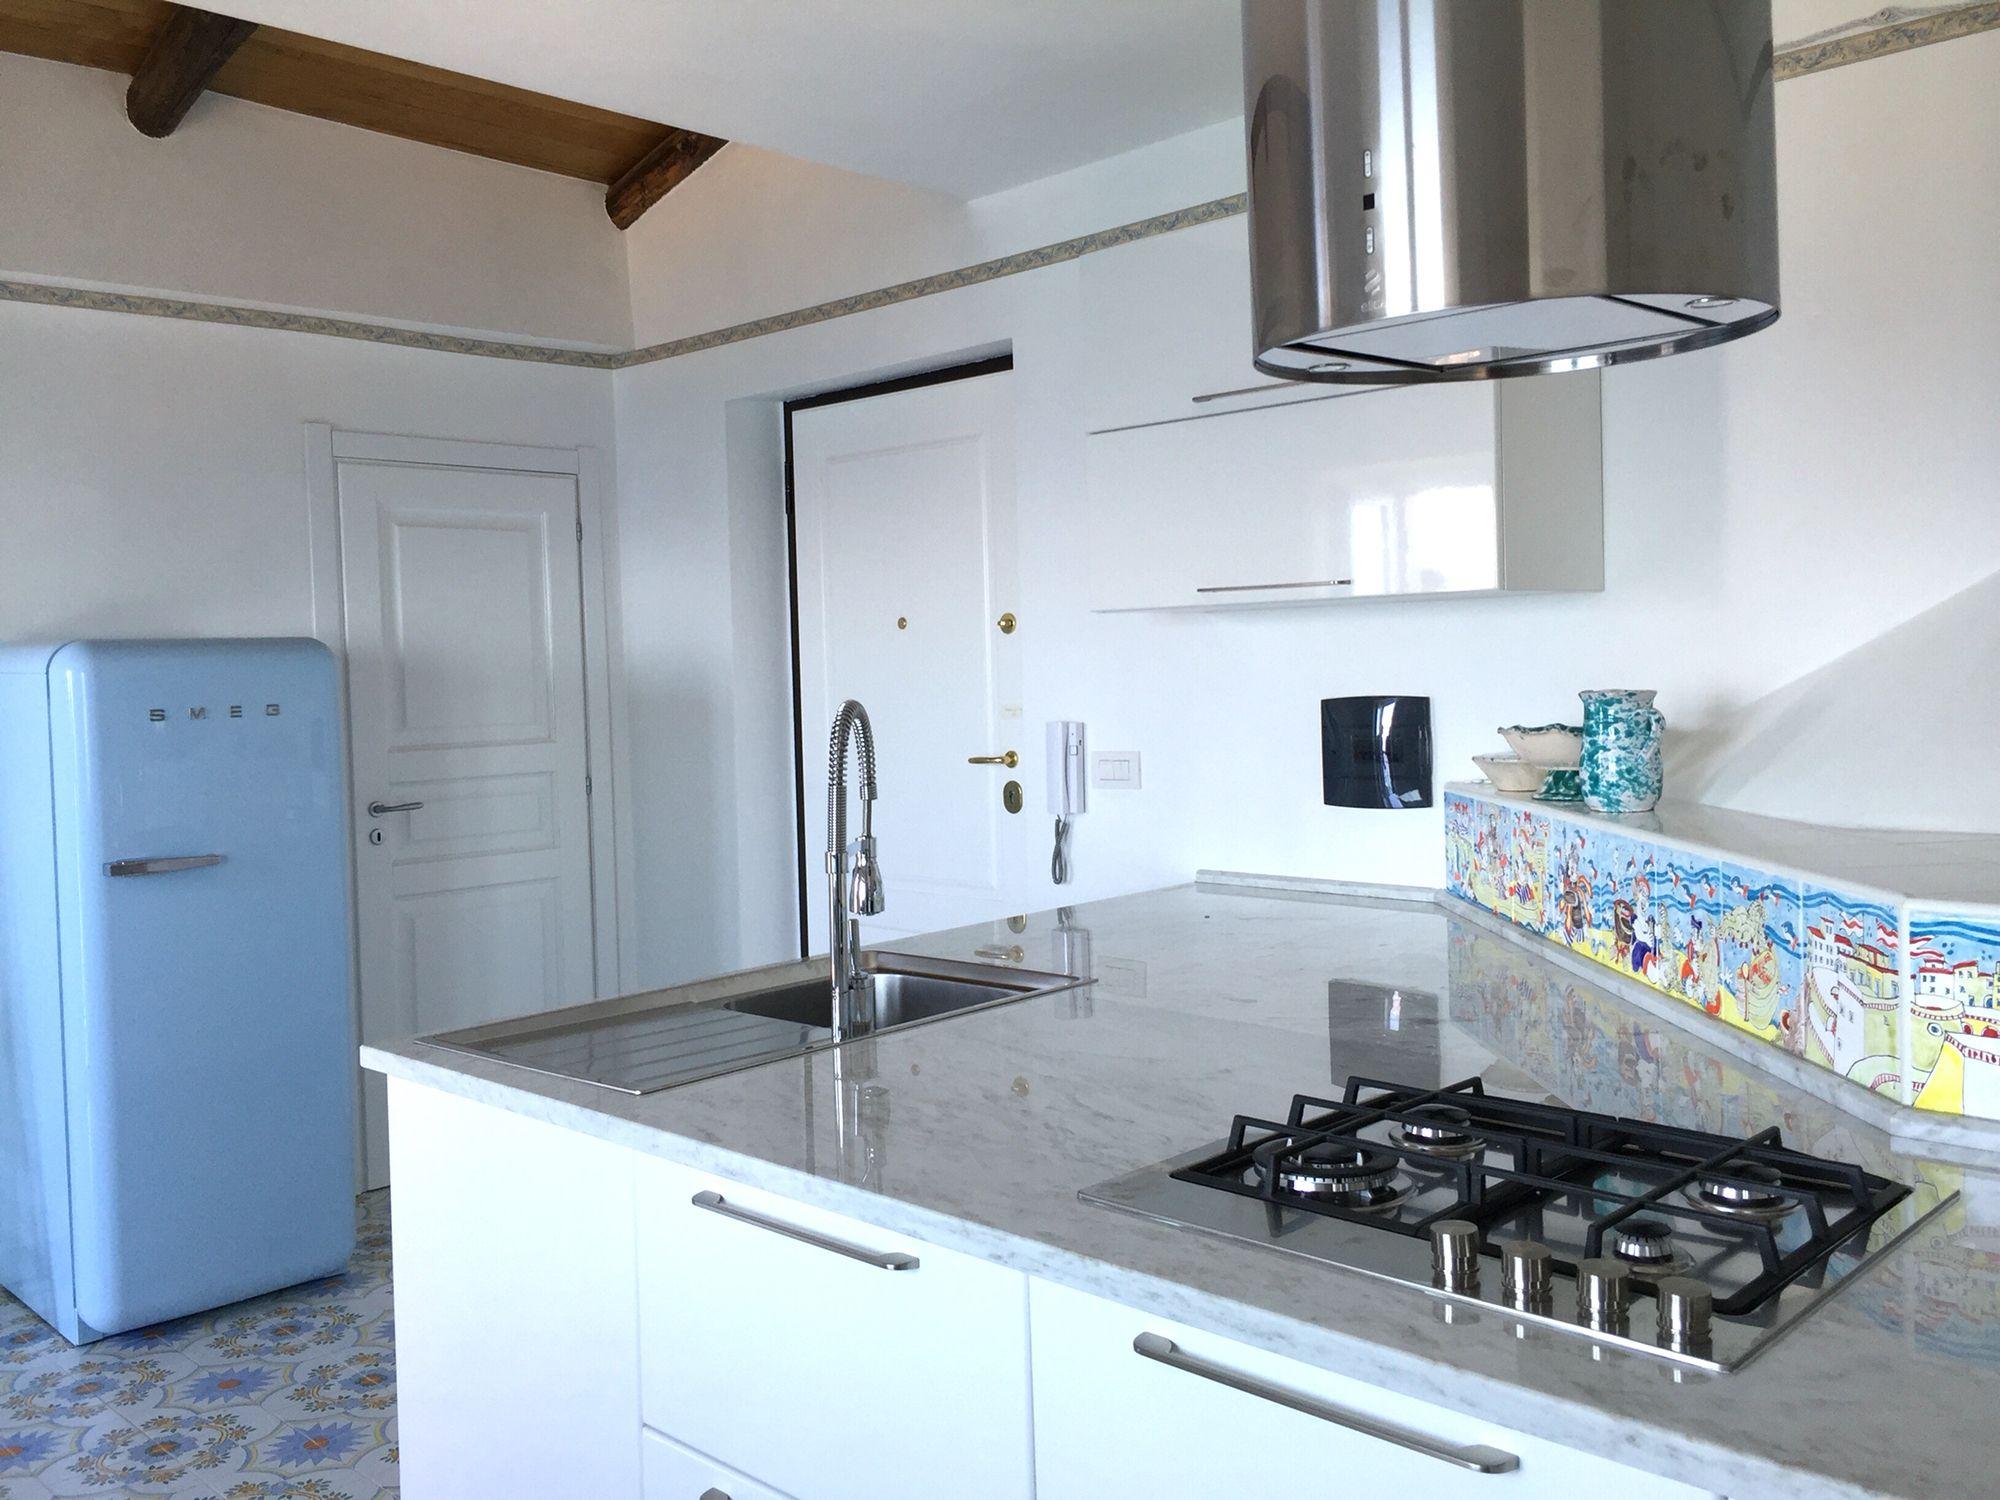 Smeg azzurro - kitchen accomplished Palazzo Pizzo Dependance delle ...